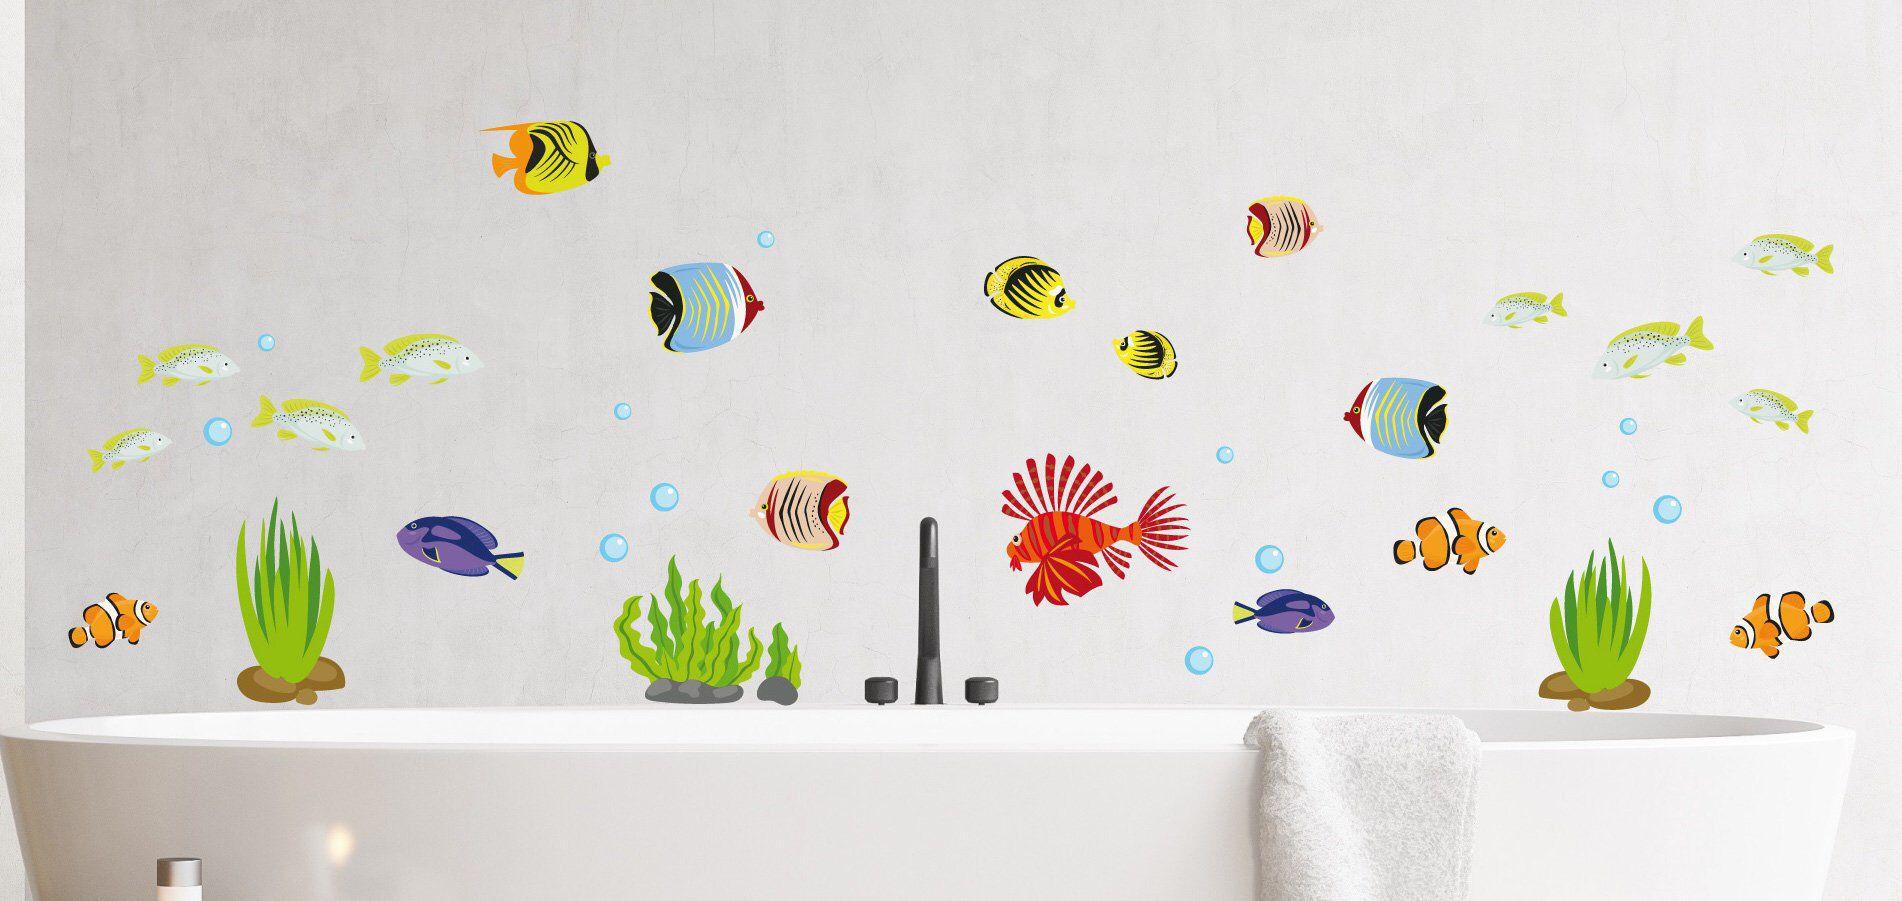 Fische Wandtattoo Wandsticker Aquarium Wandbild Badezimmer Meer